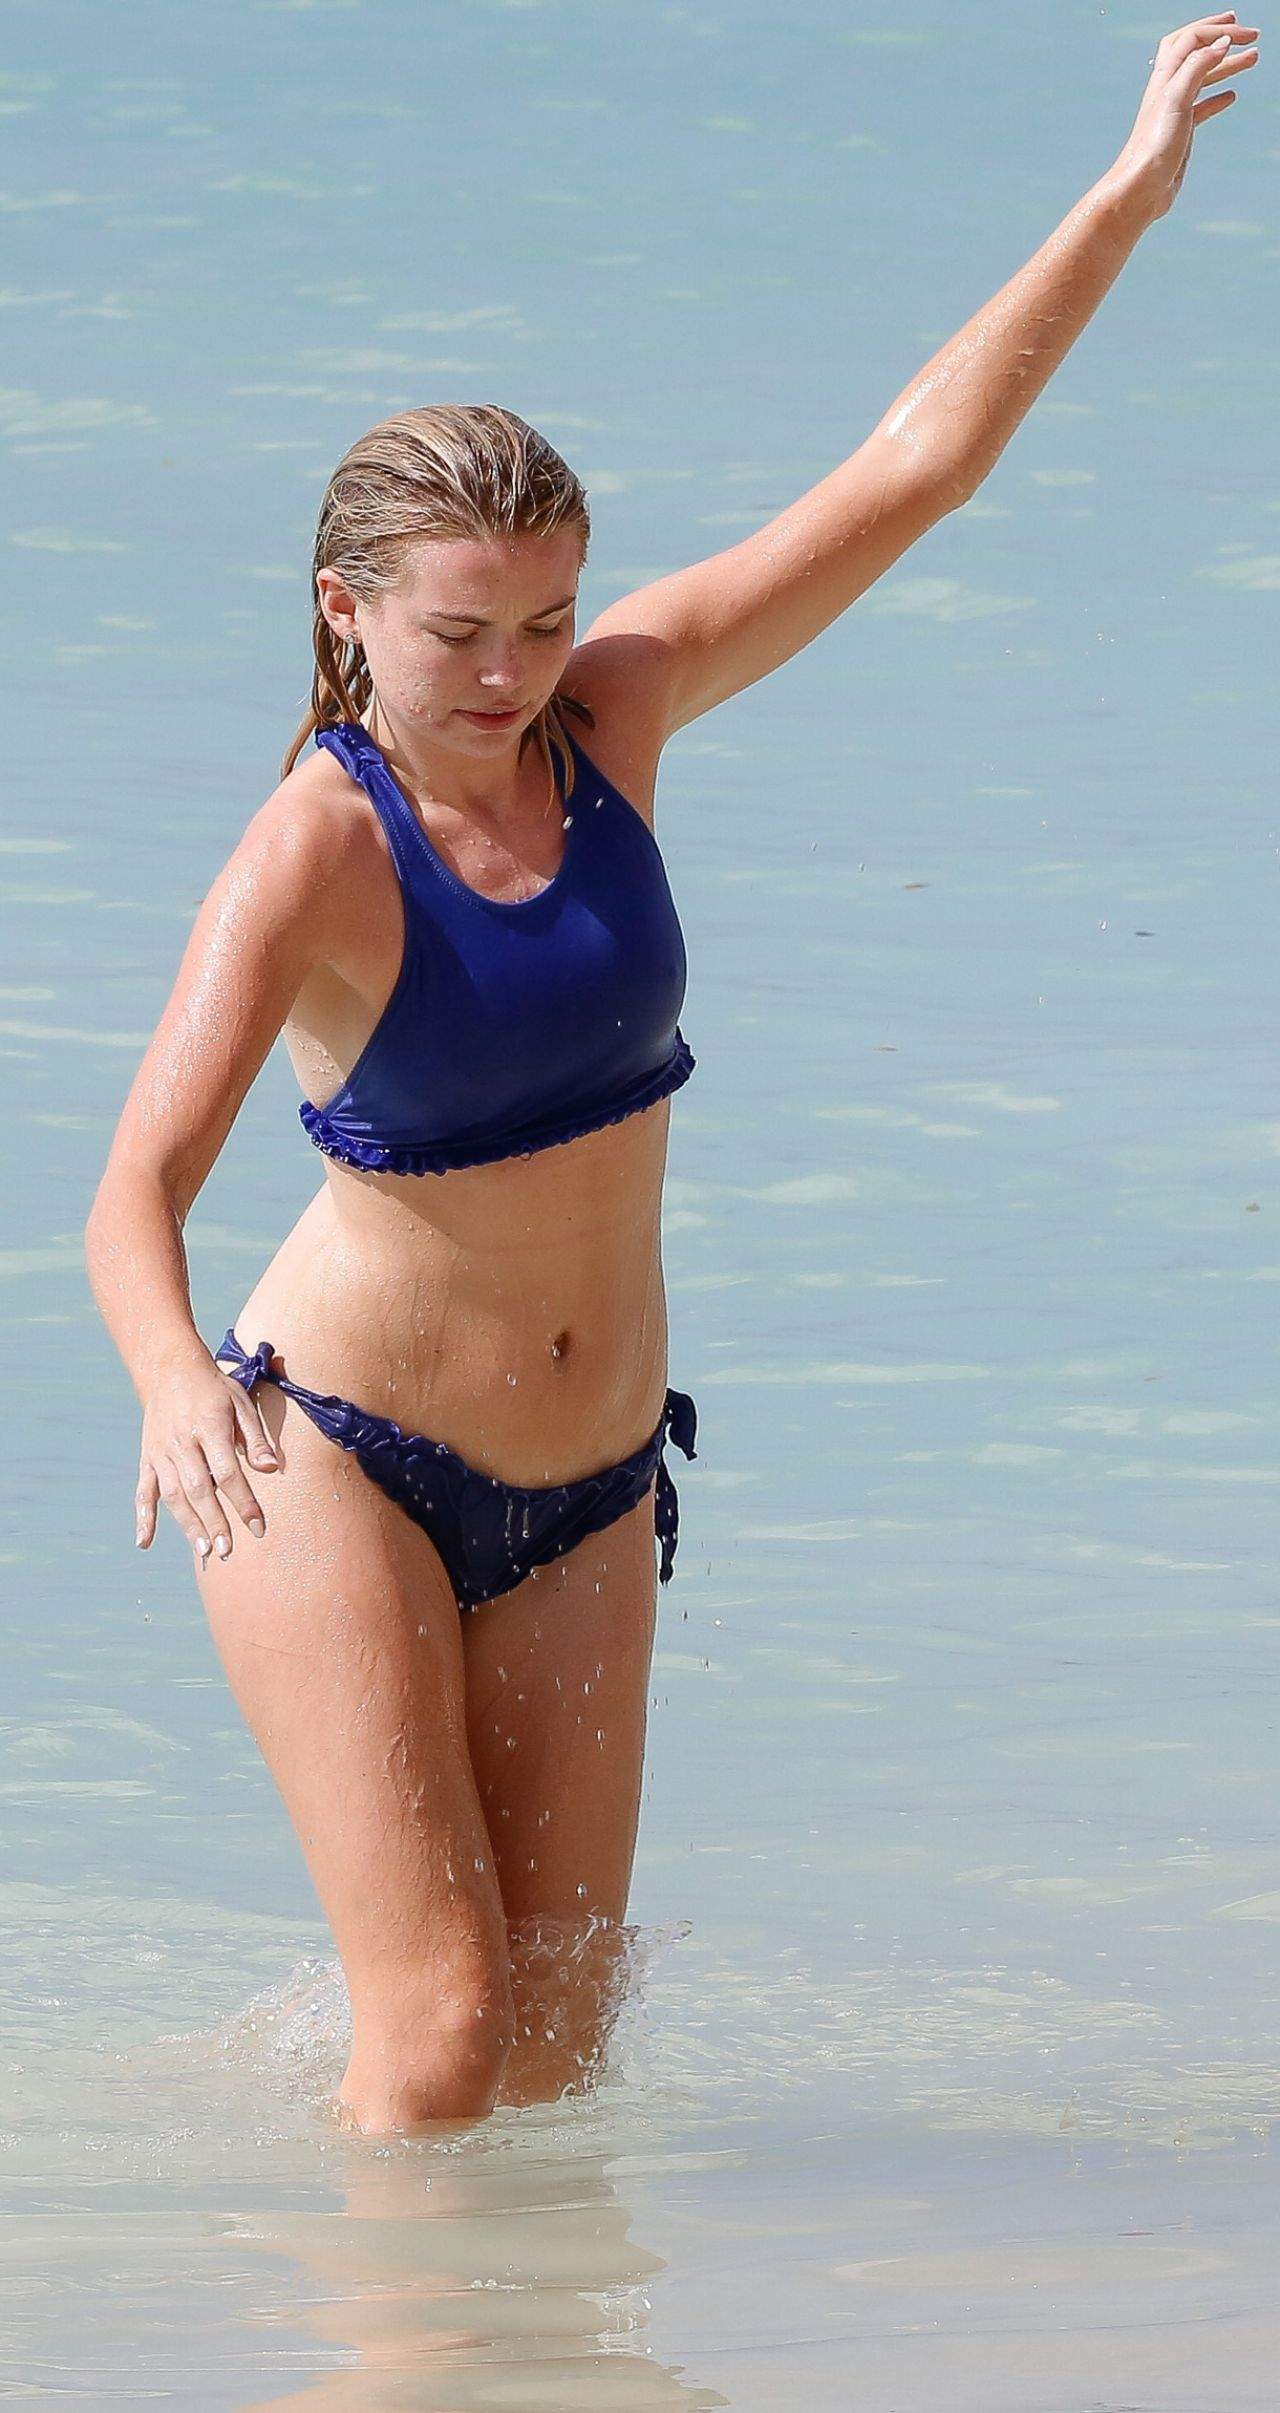 Bikini Camila Quintero nudes (17 foto and video), Pussy, Leaked, Selfie, braless 2006